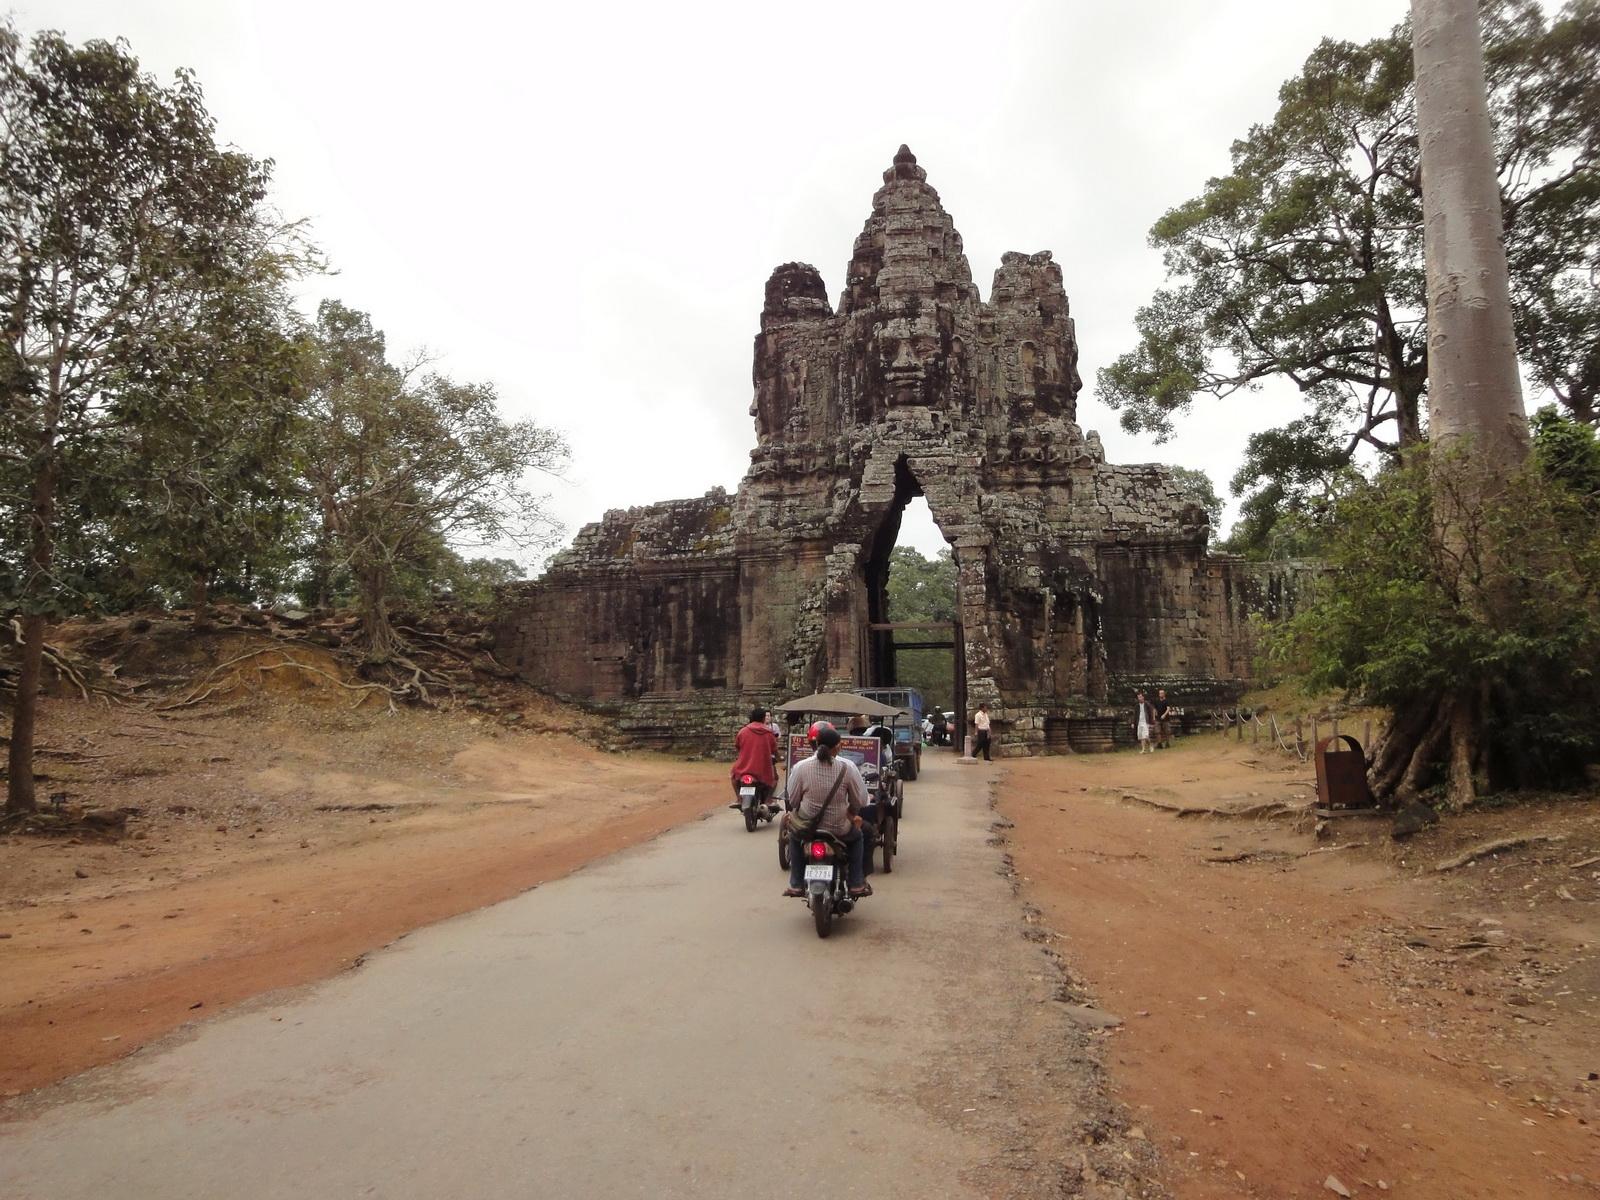 Face tower of the South Gate showing Avalokiteshvara Jan 2010 11